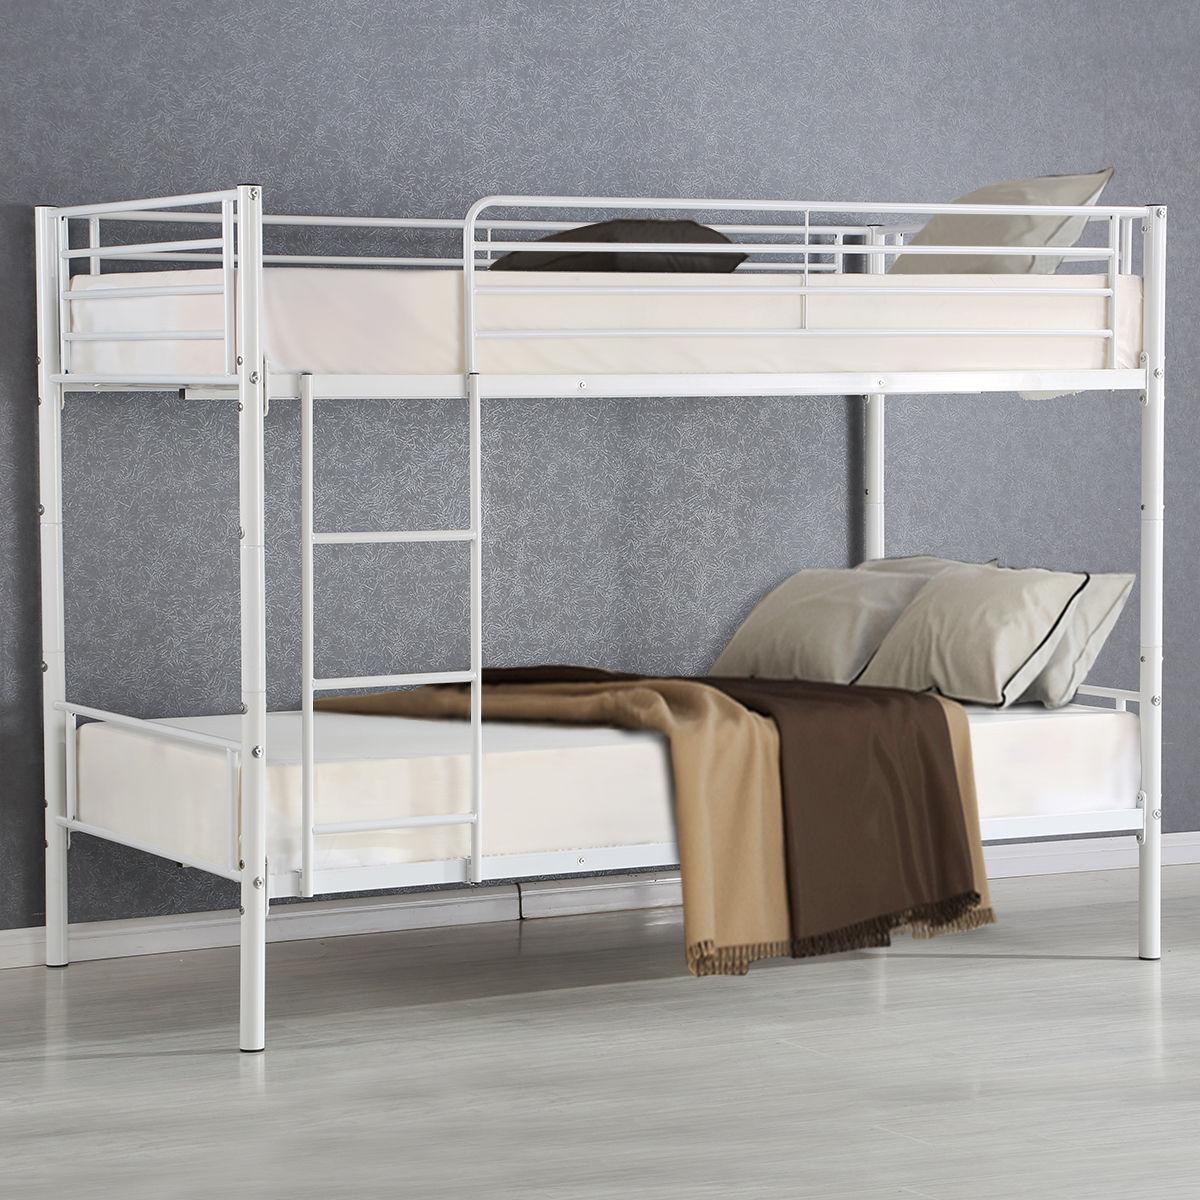 Giantex Metal Twin Over Twin Bunk Bed Modern Metal Steel